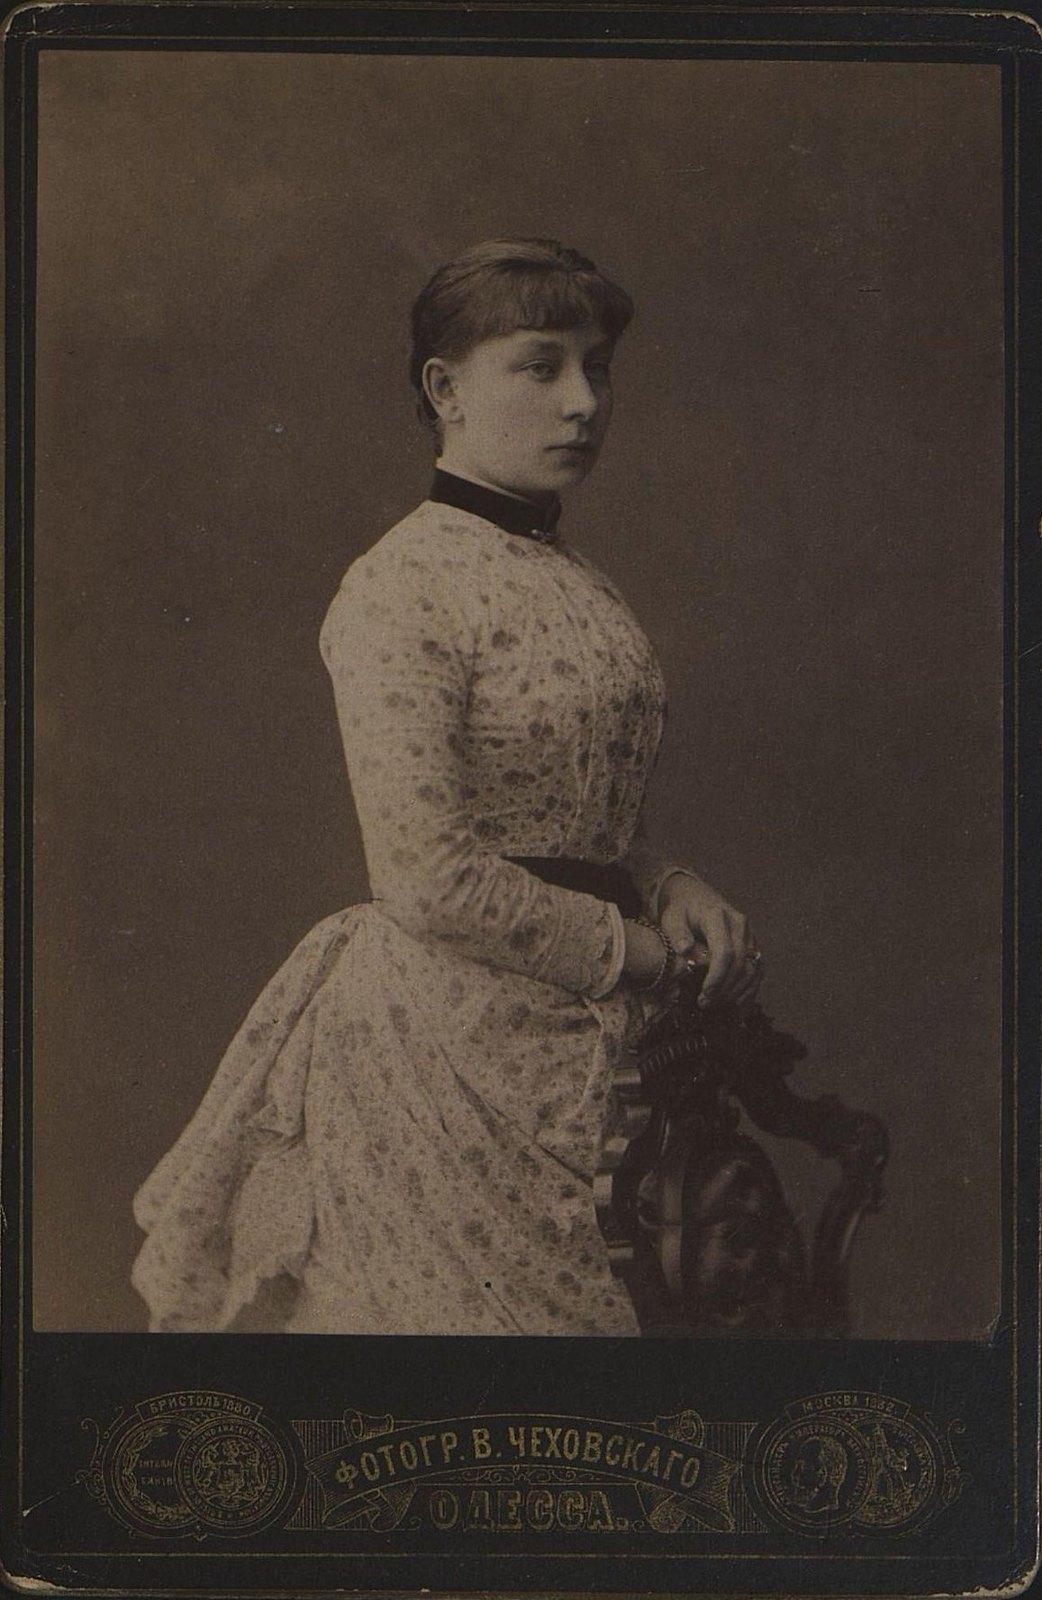 Маслова Елизавета Николаевна. 14 октября 1884